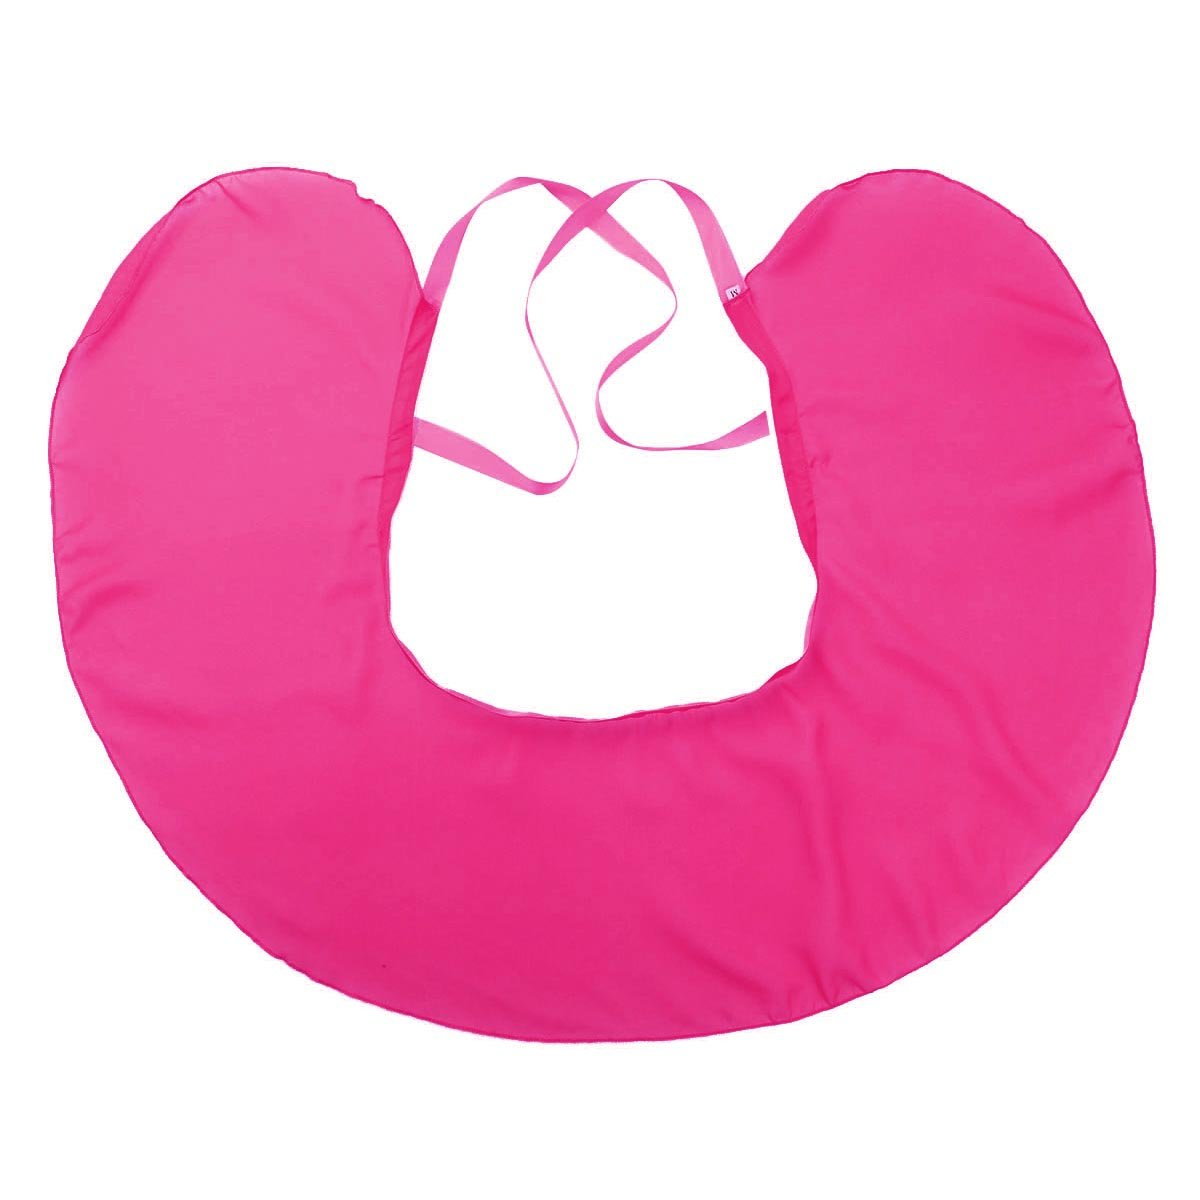 iixpin Kids Girls 2 Pieces Ballet Dance Dress Chiffon Skirt Adjustable Shoulder Straps Leotard with Miniskirt Set